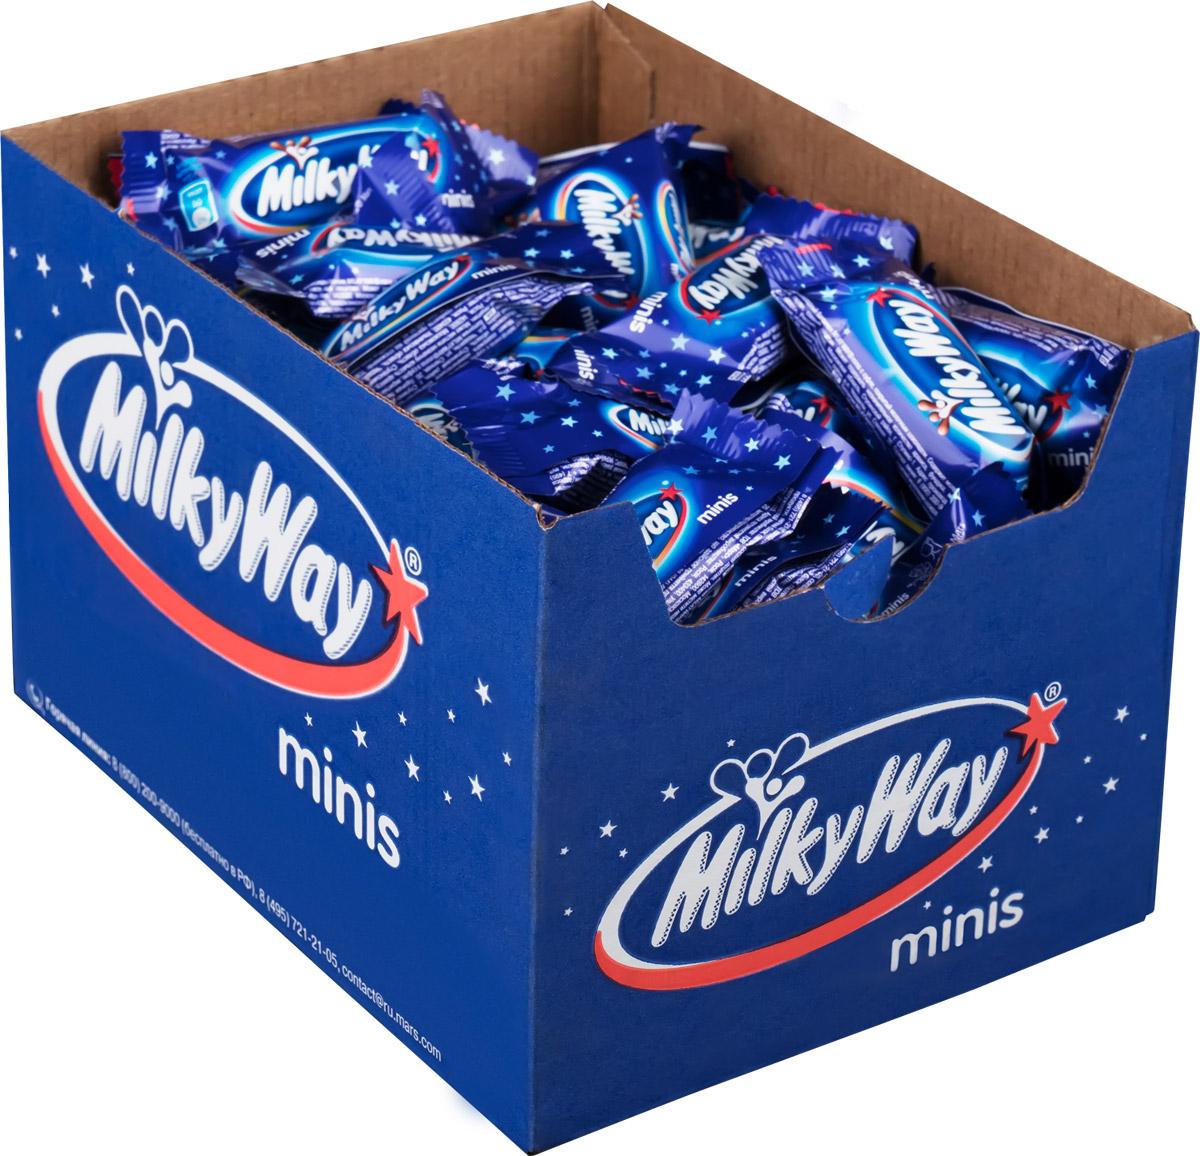 цены Milky Way minis шоколадный батончик, 1 кг